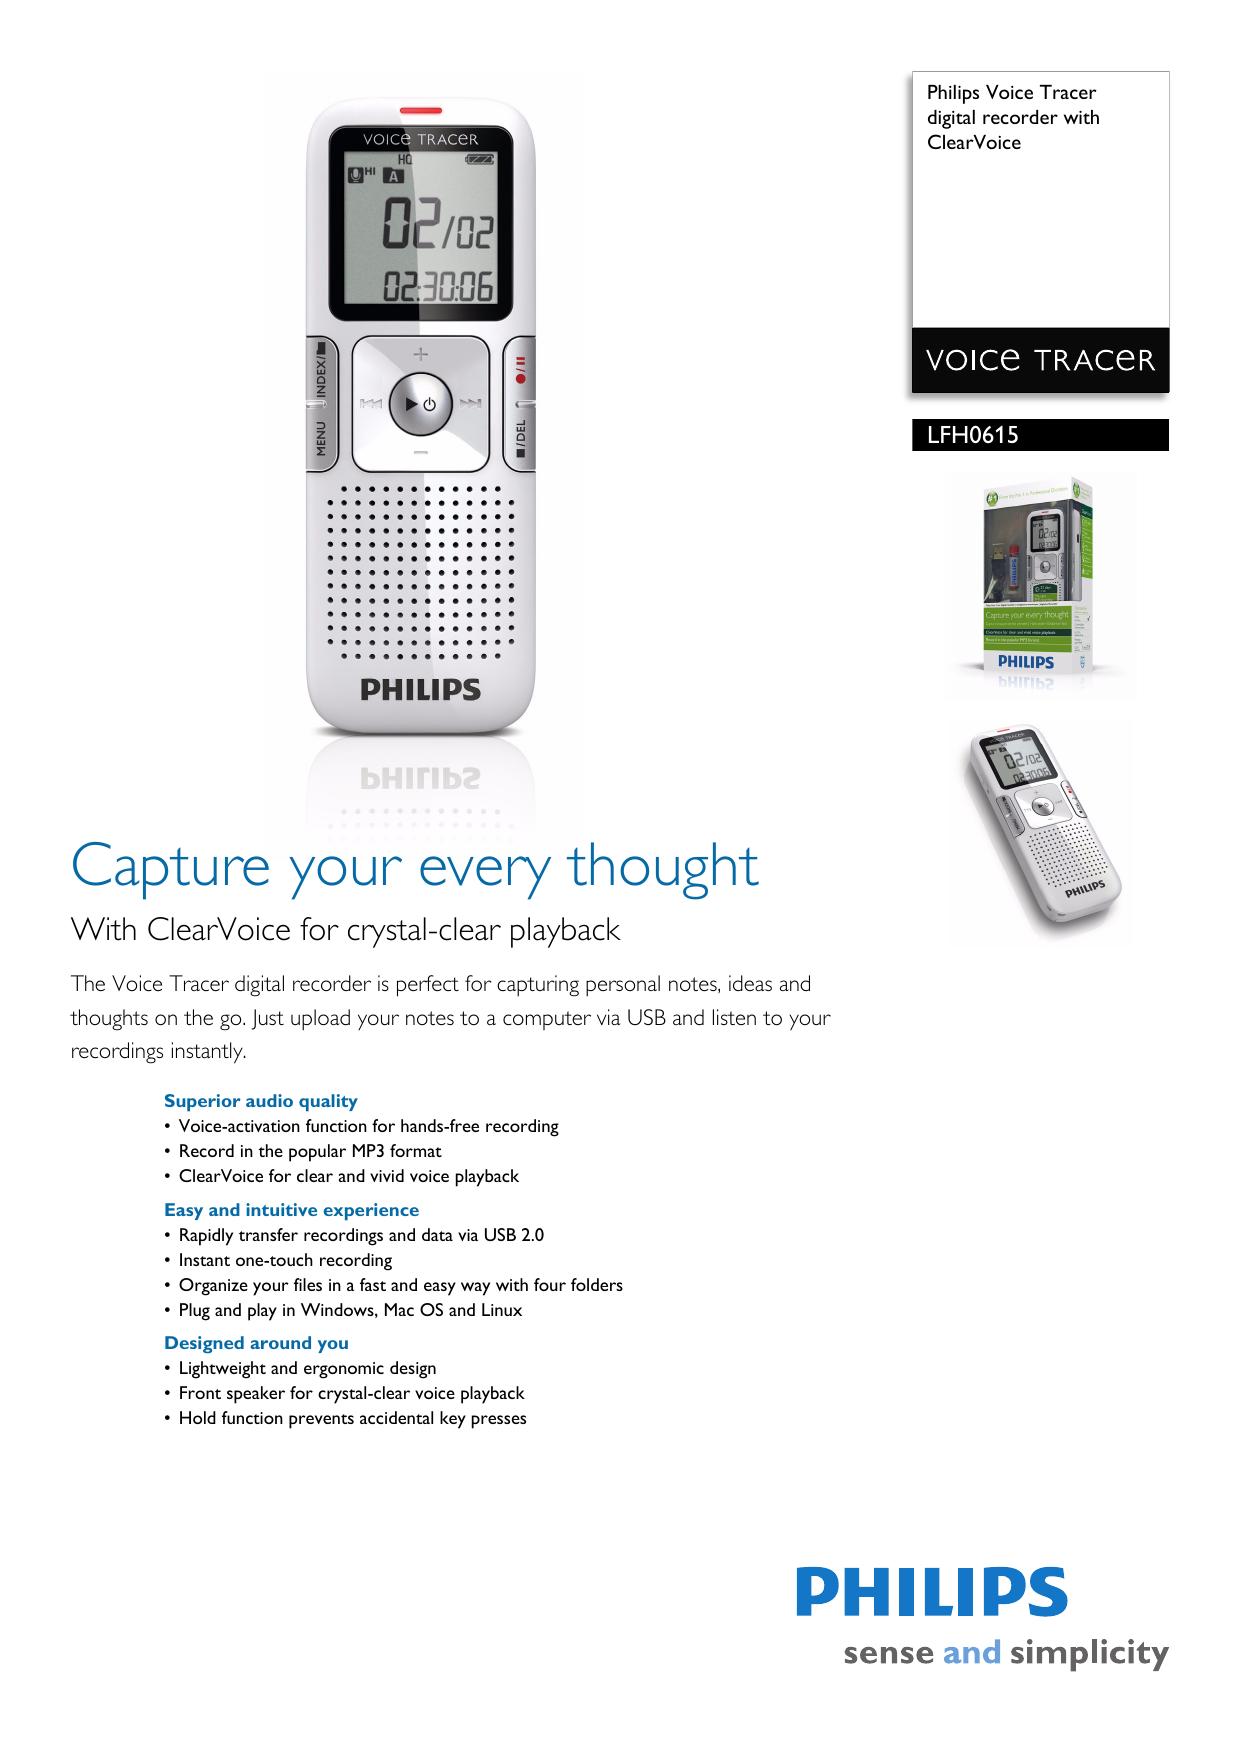 PHILIPS LFH065227 DIGITAL RECORDER DRIVERS FOR WINDOWS MAC